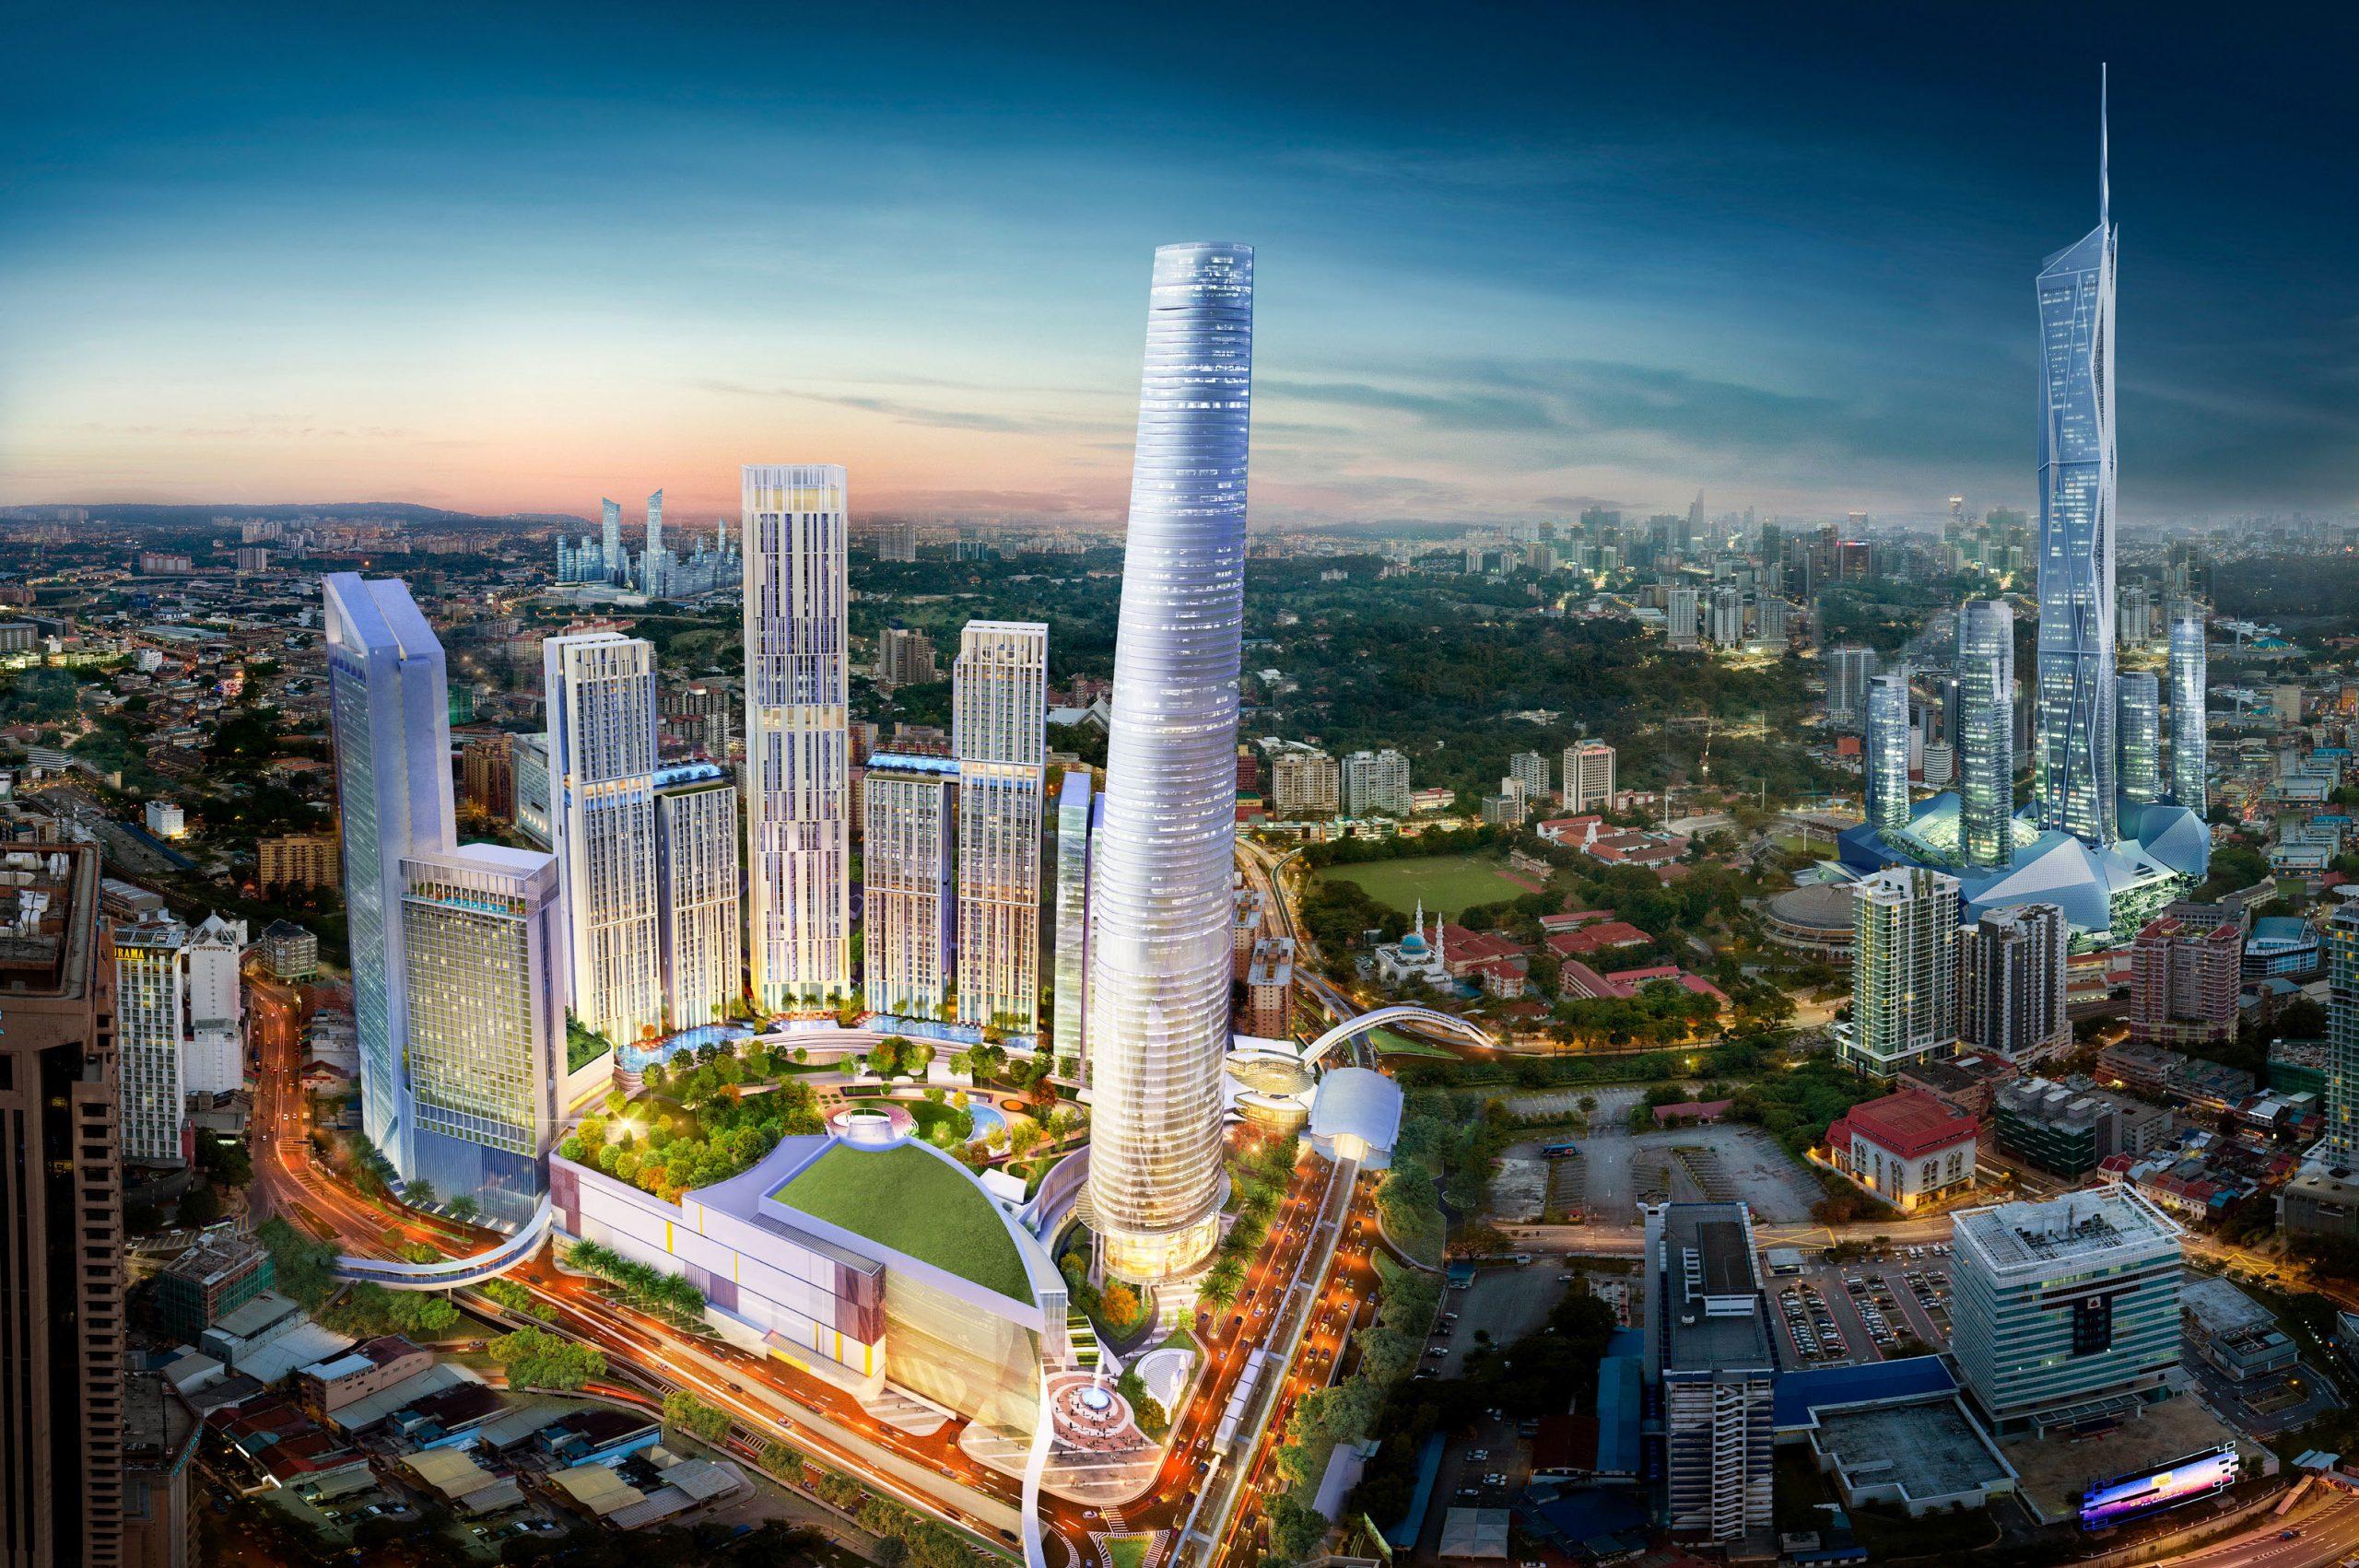 Bukit Bintang City Centre 武吉免登城中城